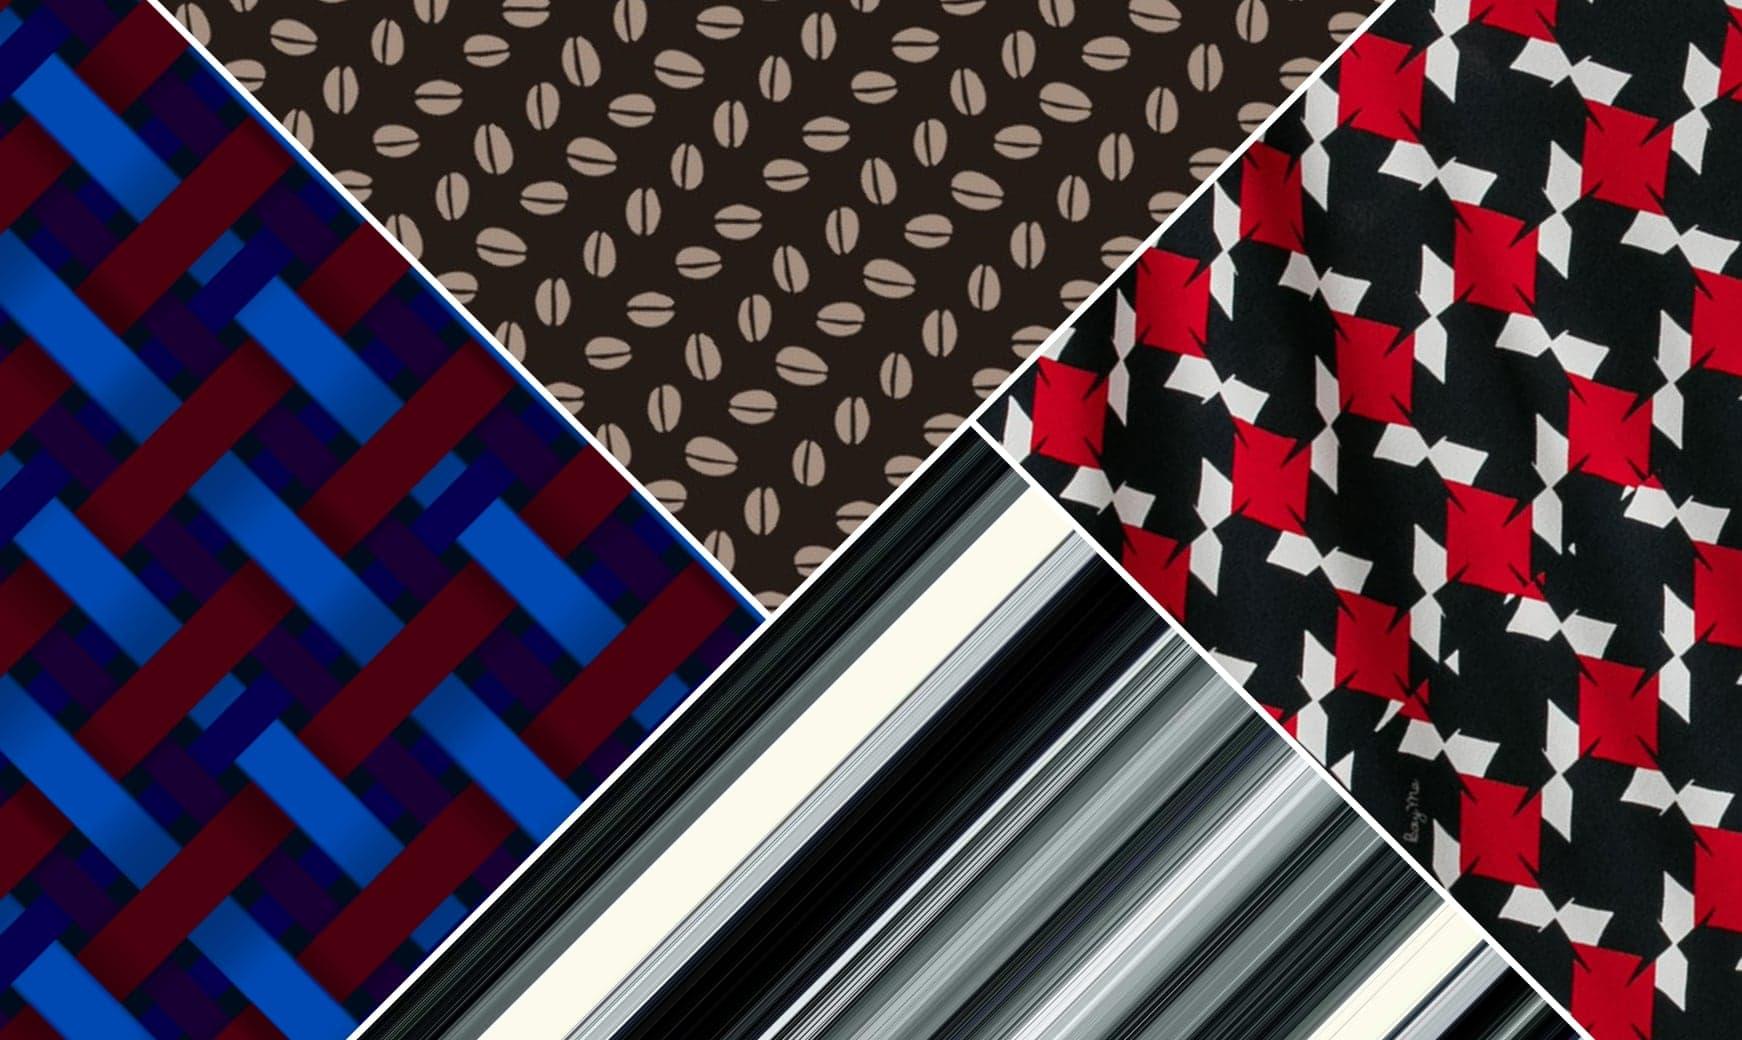 07_Other_Geometric_Print_Dresses_MV.jpg